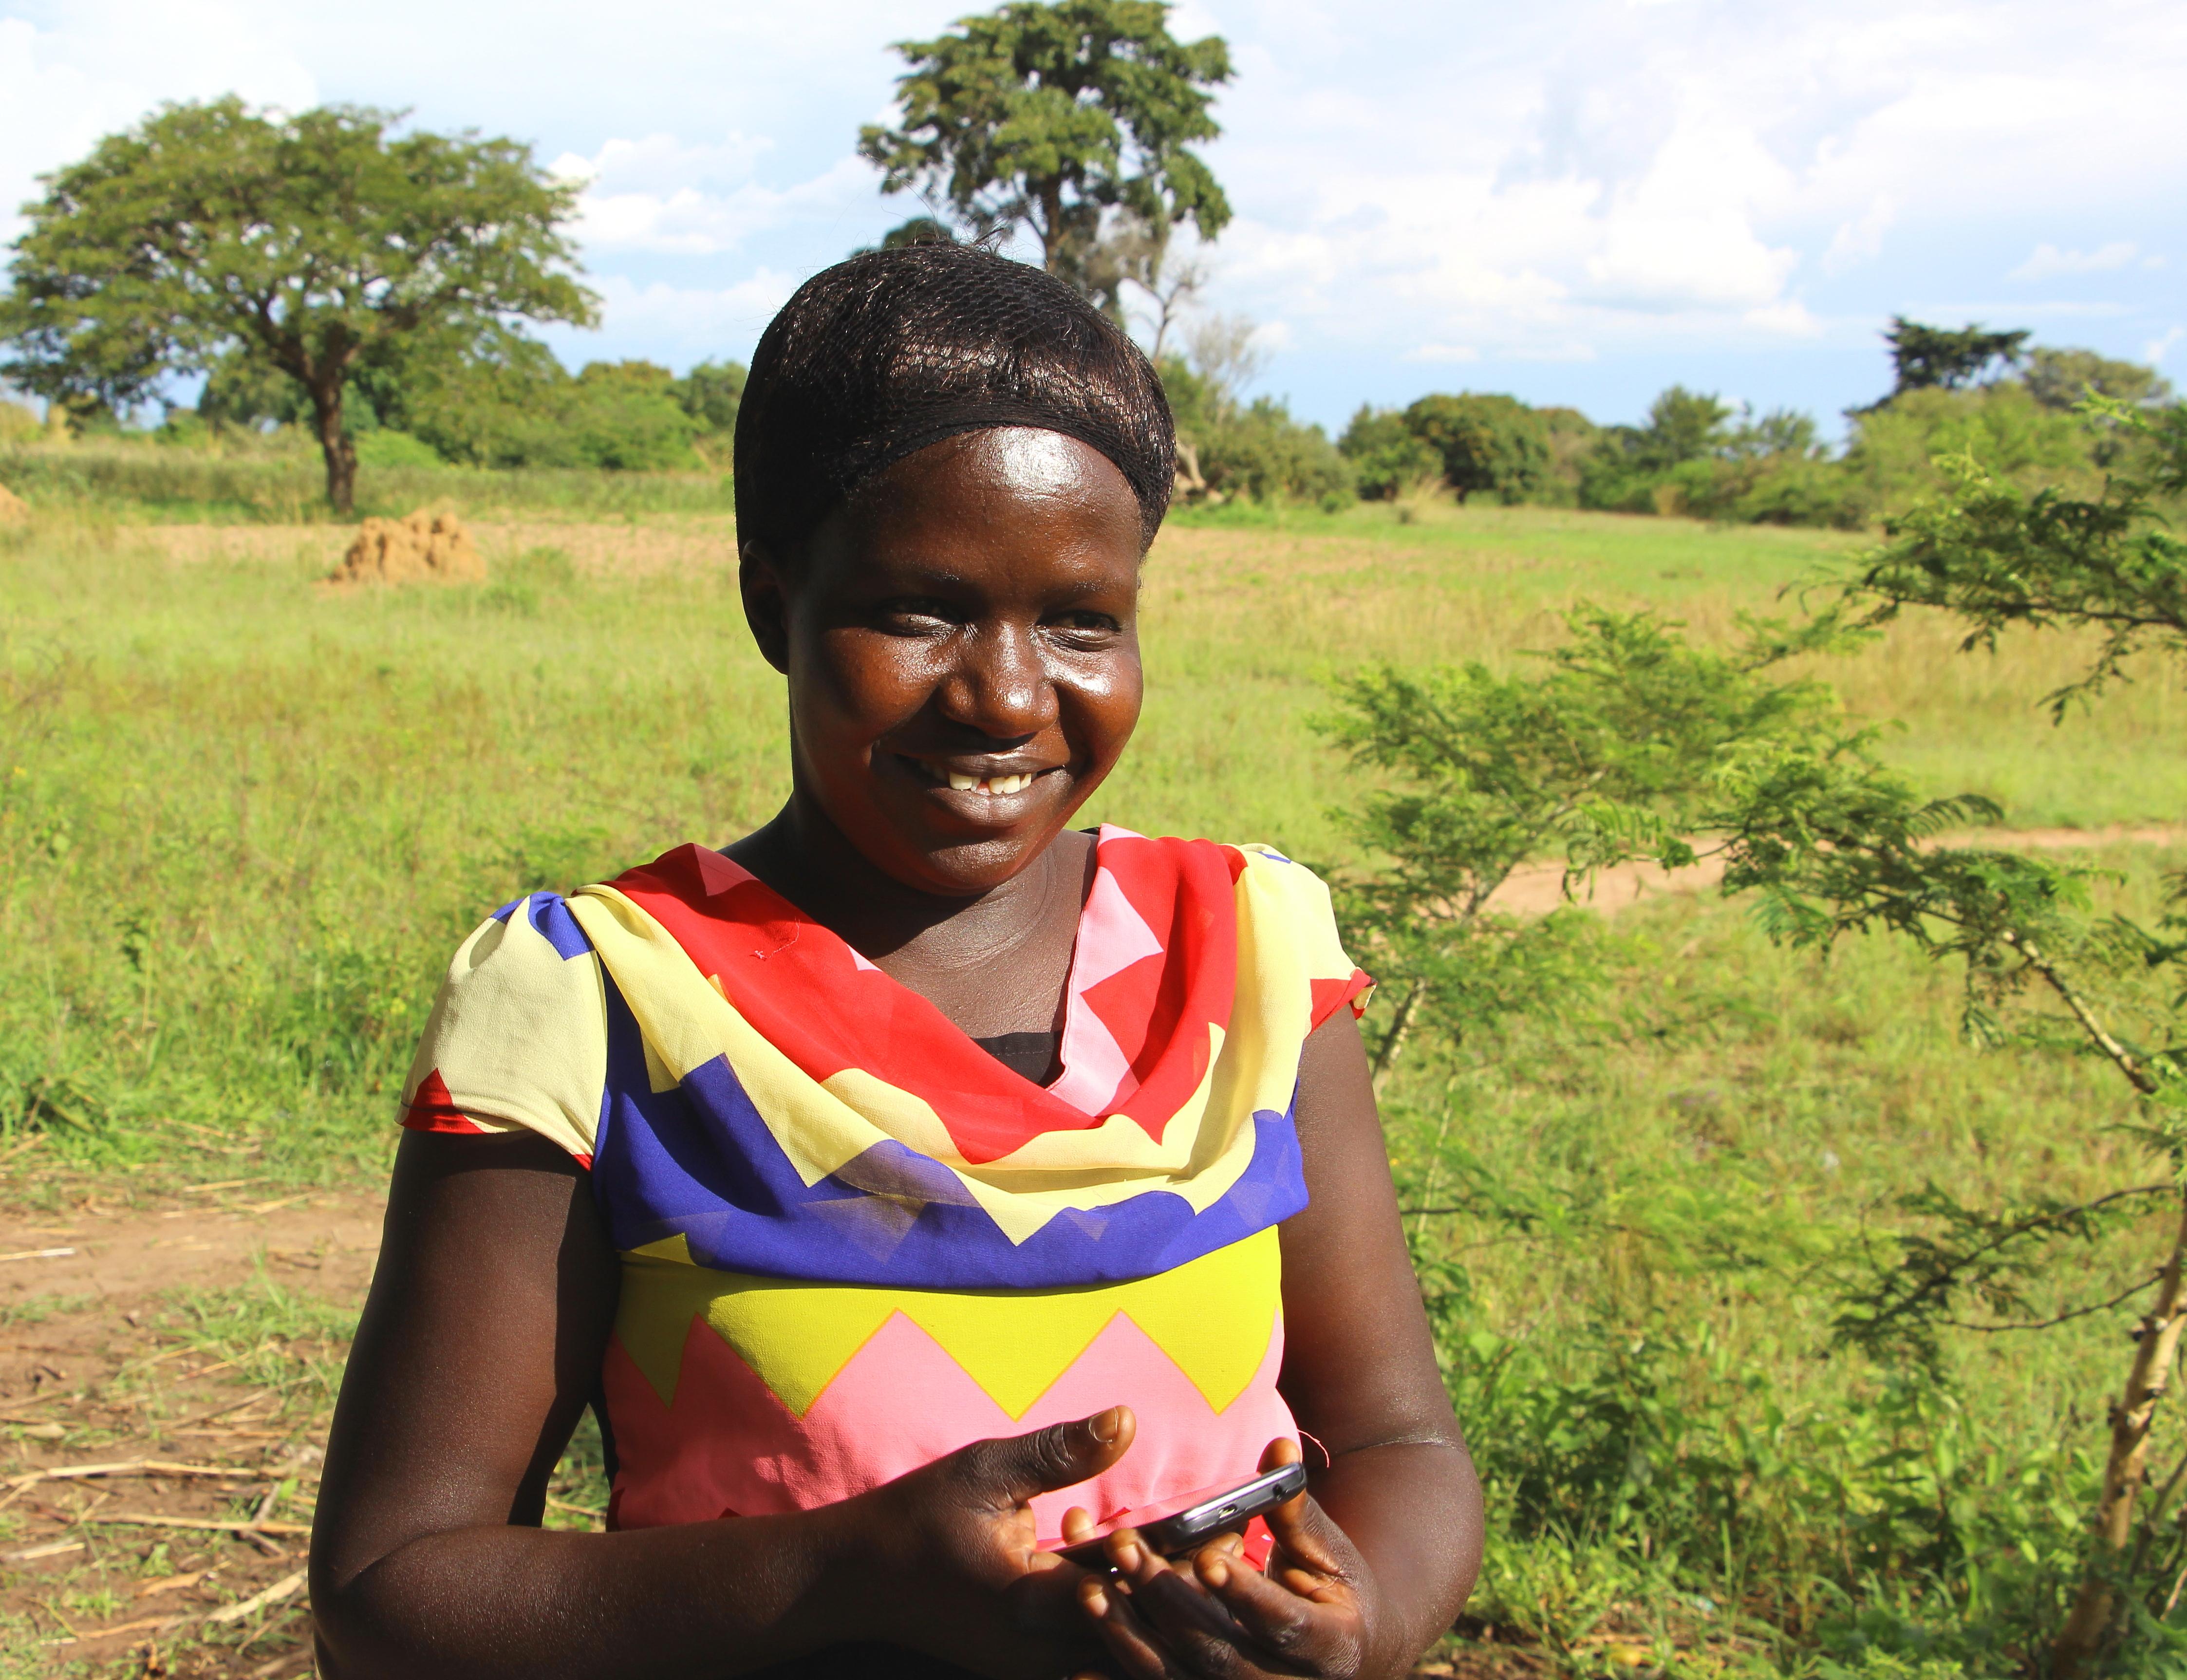 Village Enterprise Business Mentor, Esther Apolot